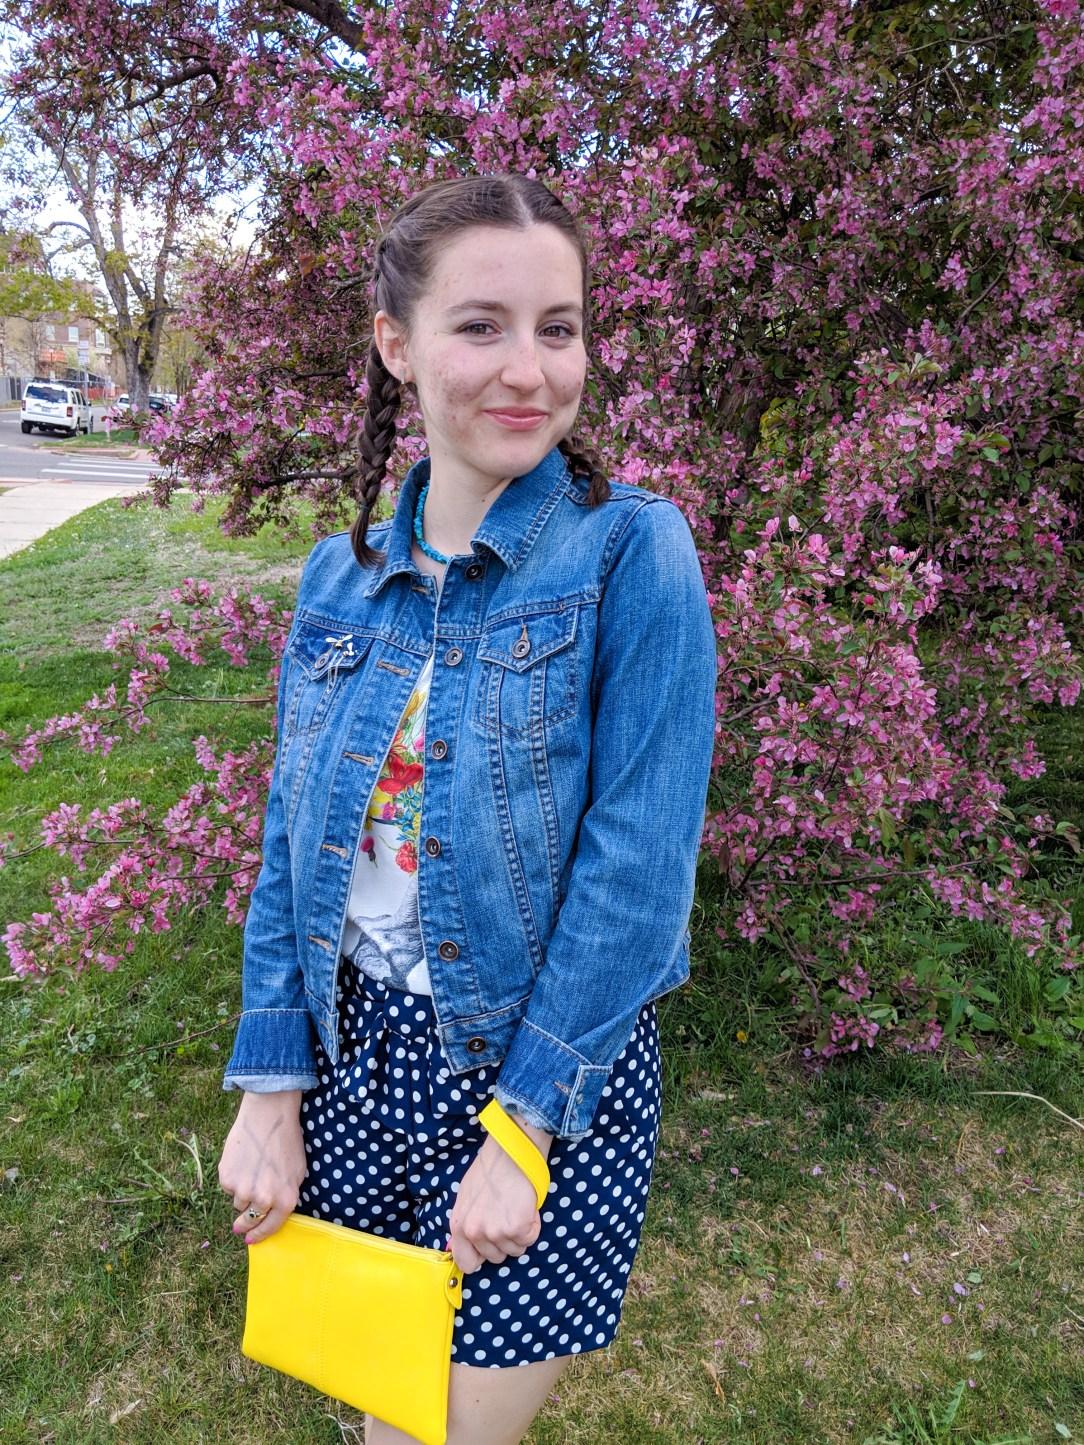 polka dot shorts, graphic tee, yellow purse, jean jacket